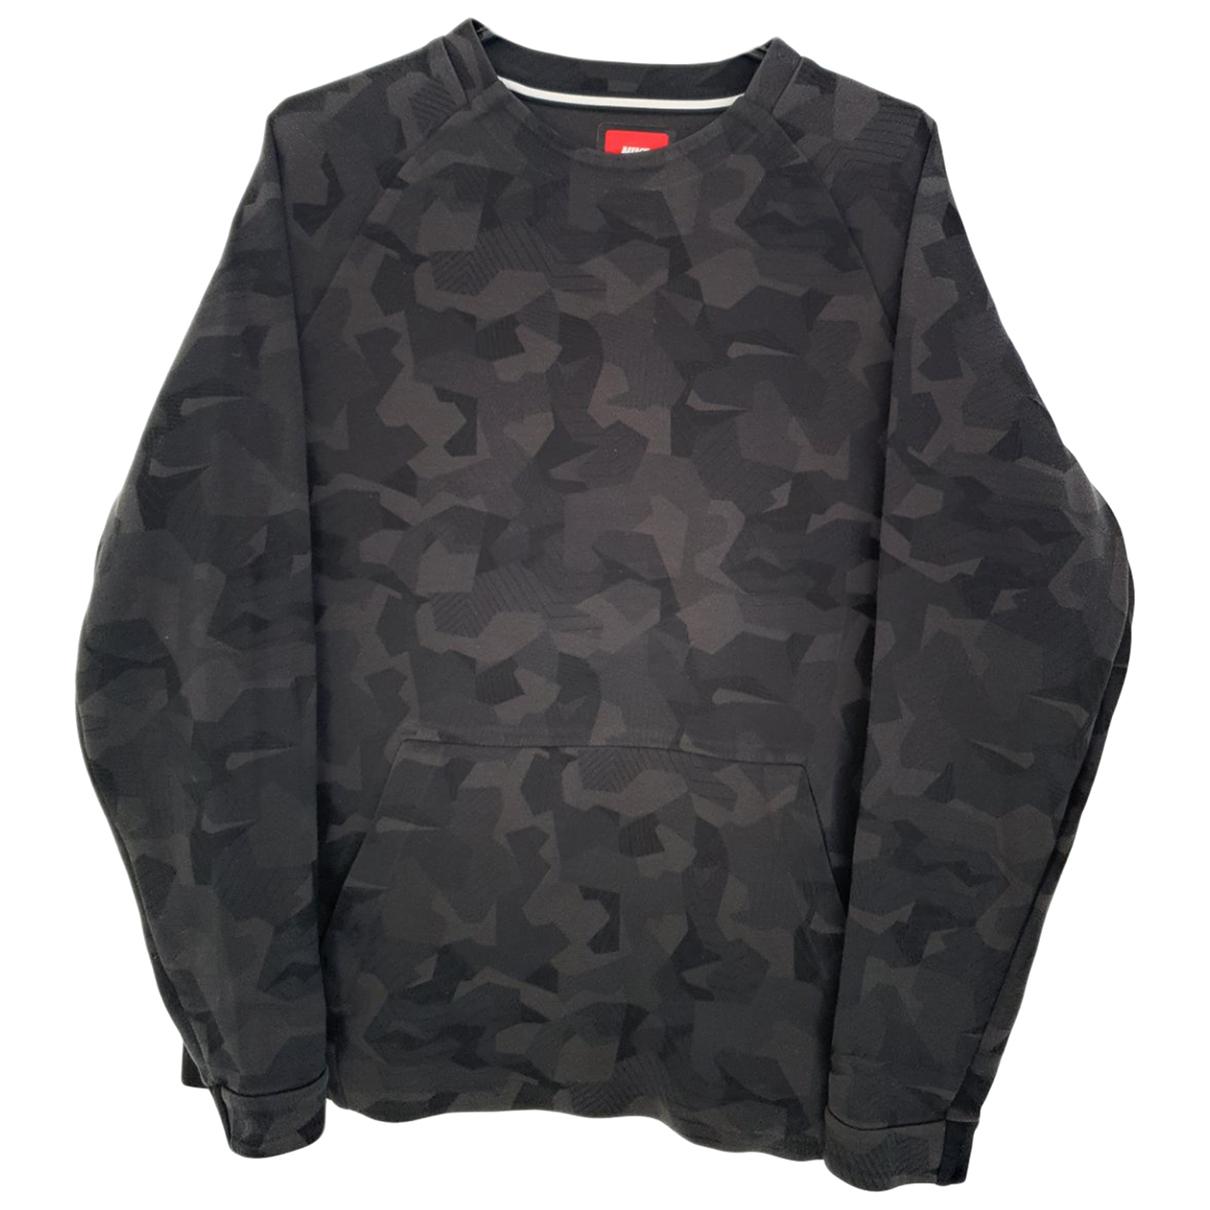 Nike \N Black Cotton Knitwear & Sweatshirts for Men M International